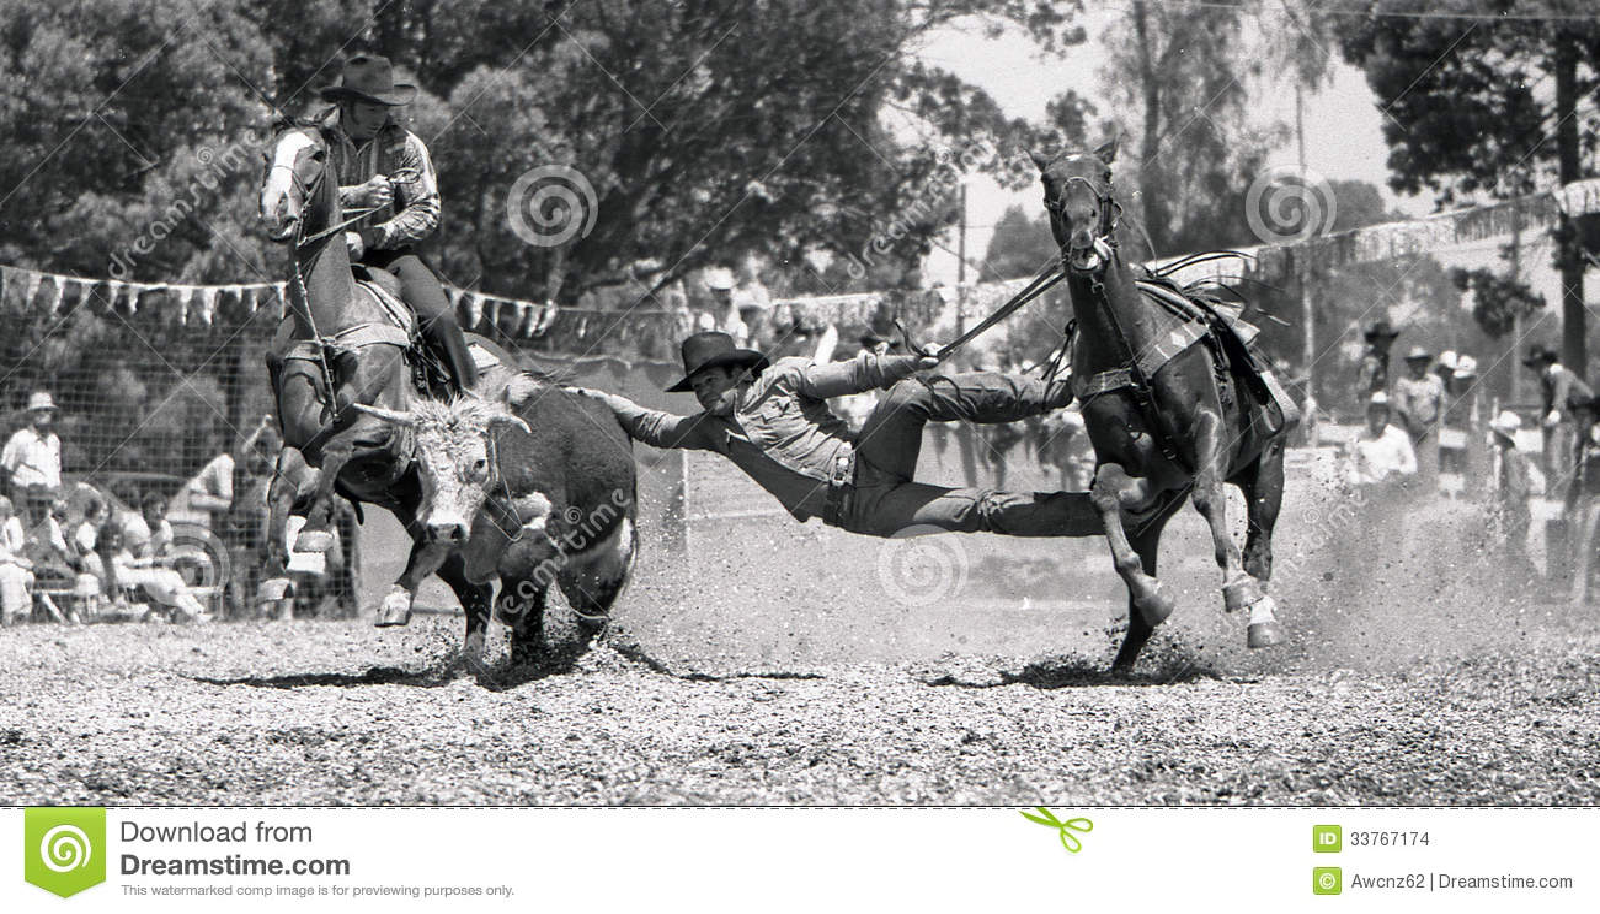 Kingaroy Australia  City new picture : ... event during a small town rodeo, circa 1980 in Kingaroy, Australia